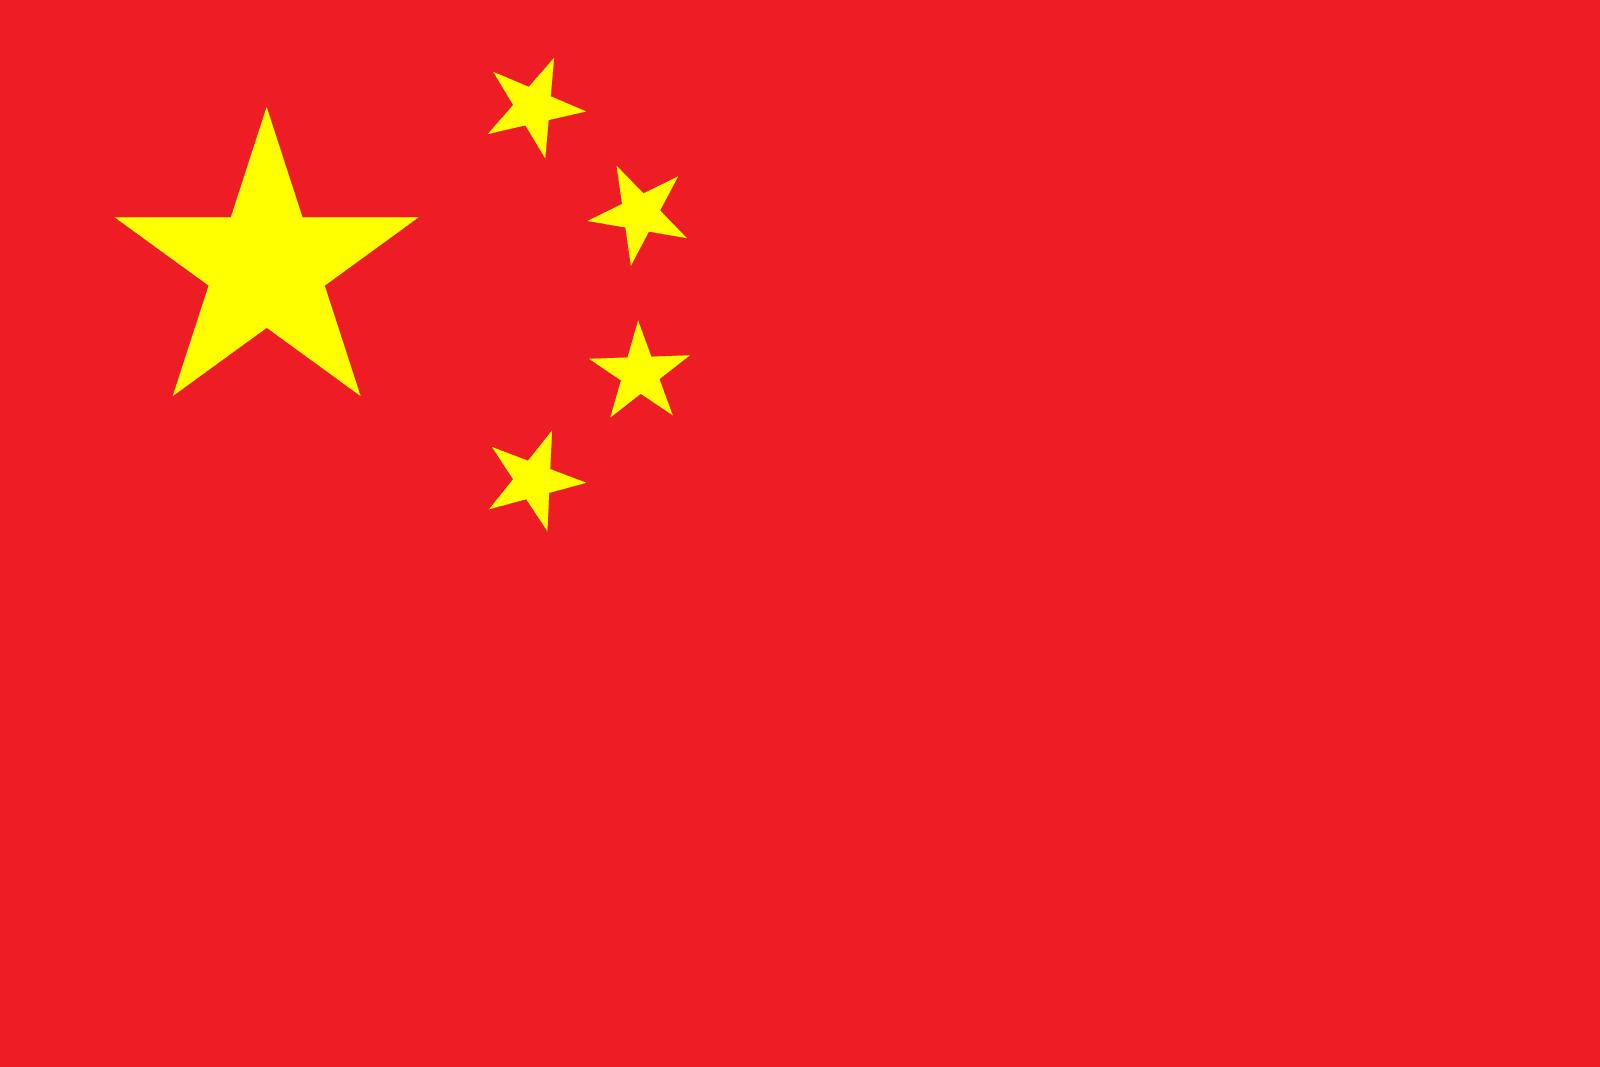 kazakistan bayrağı emoji